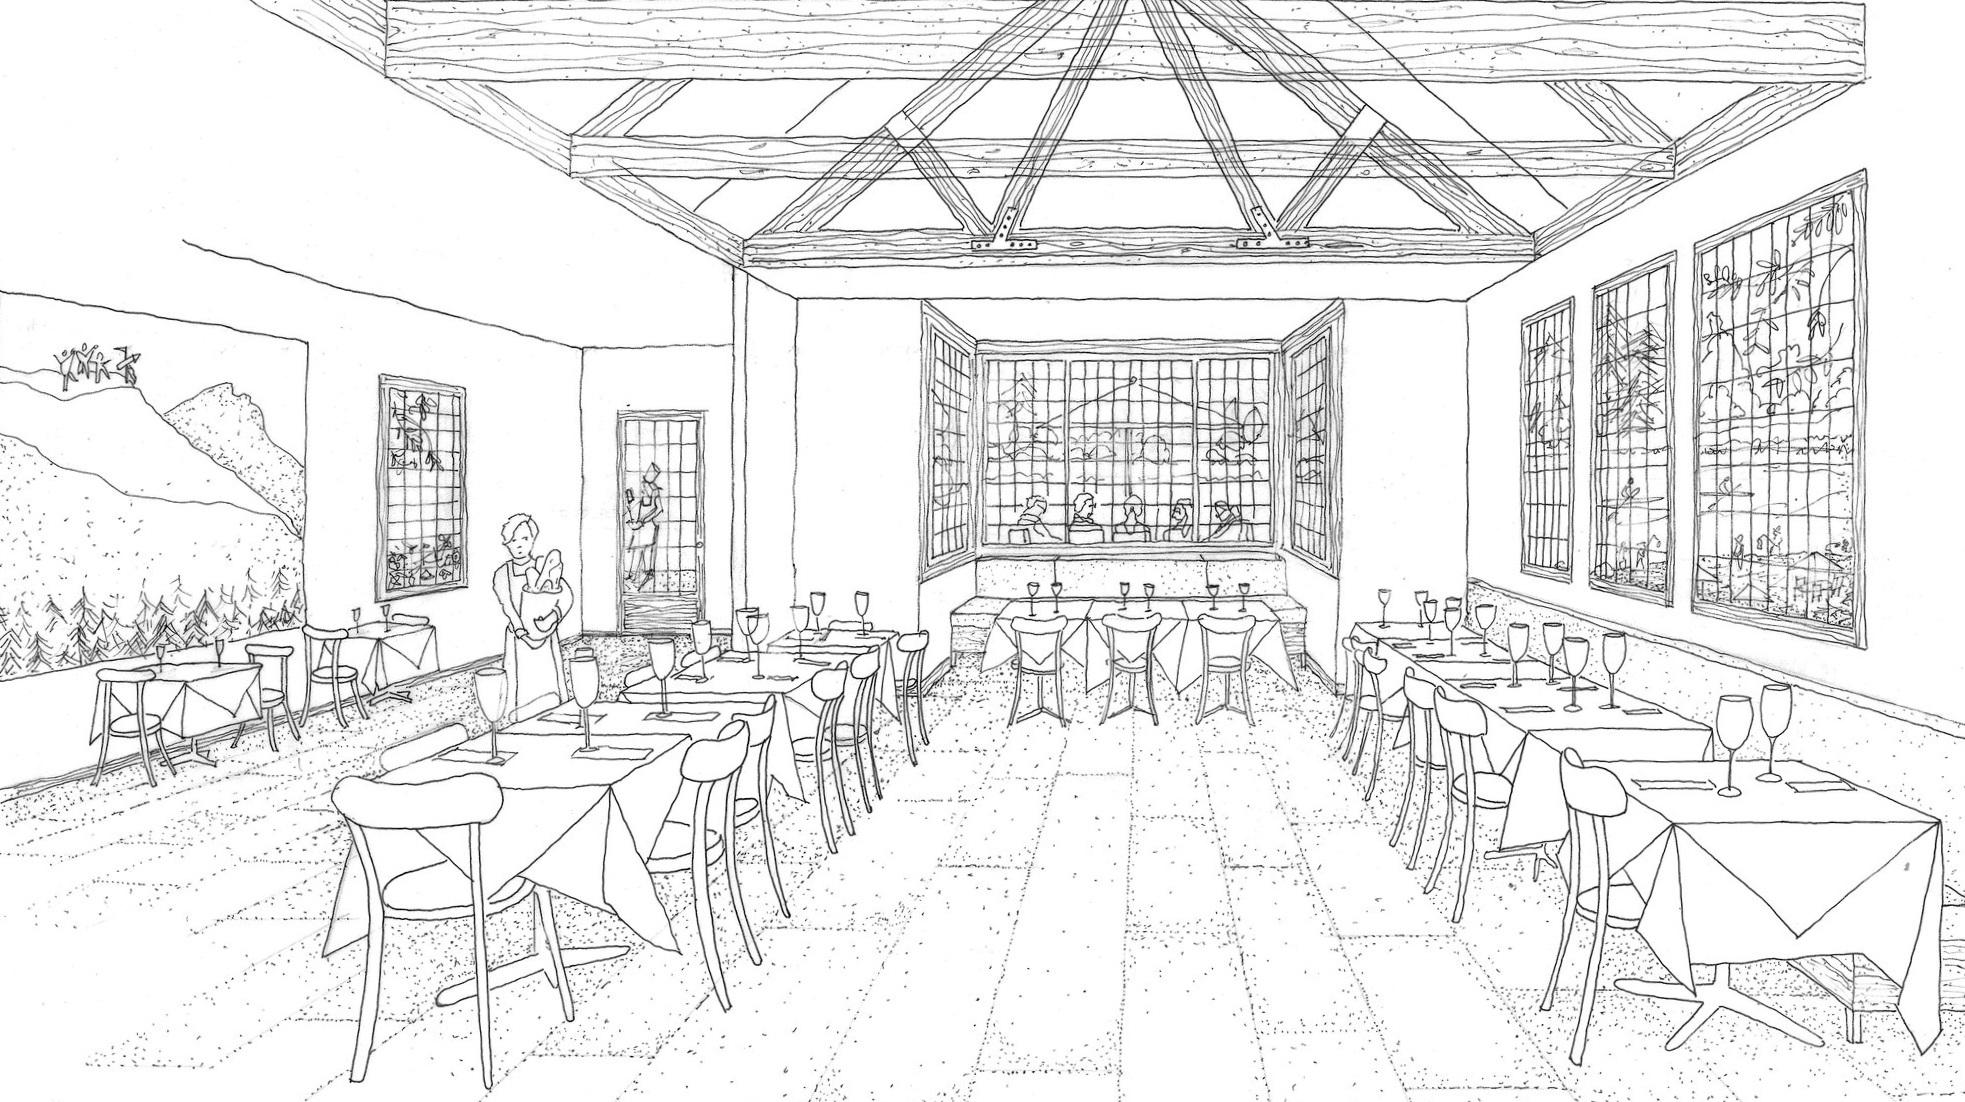 New dining room will overlook Occom Pond.